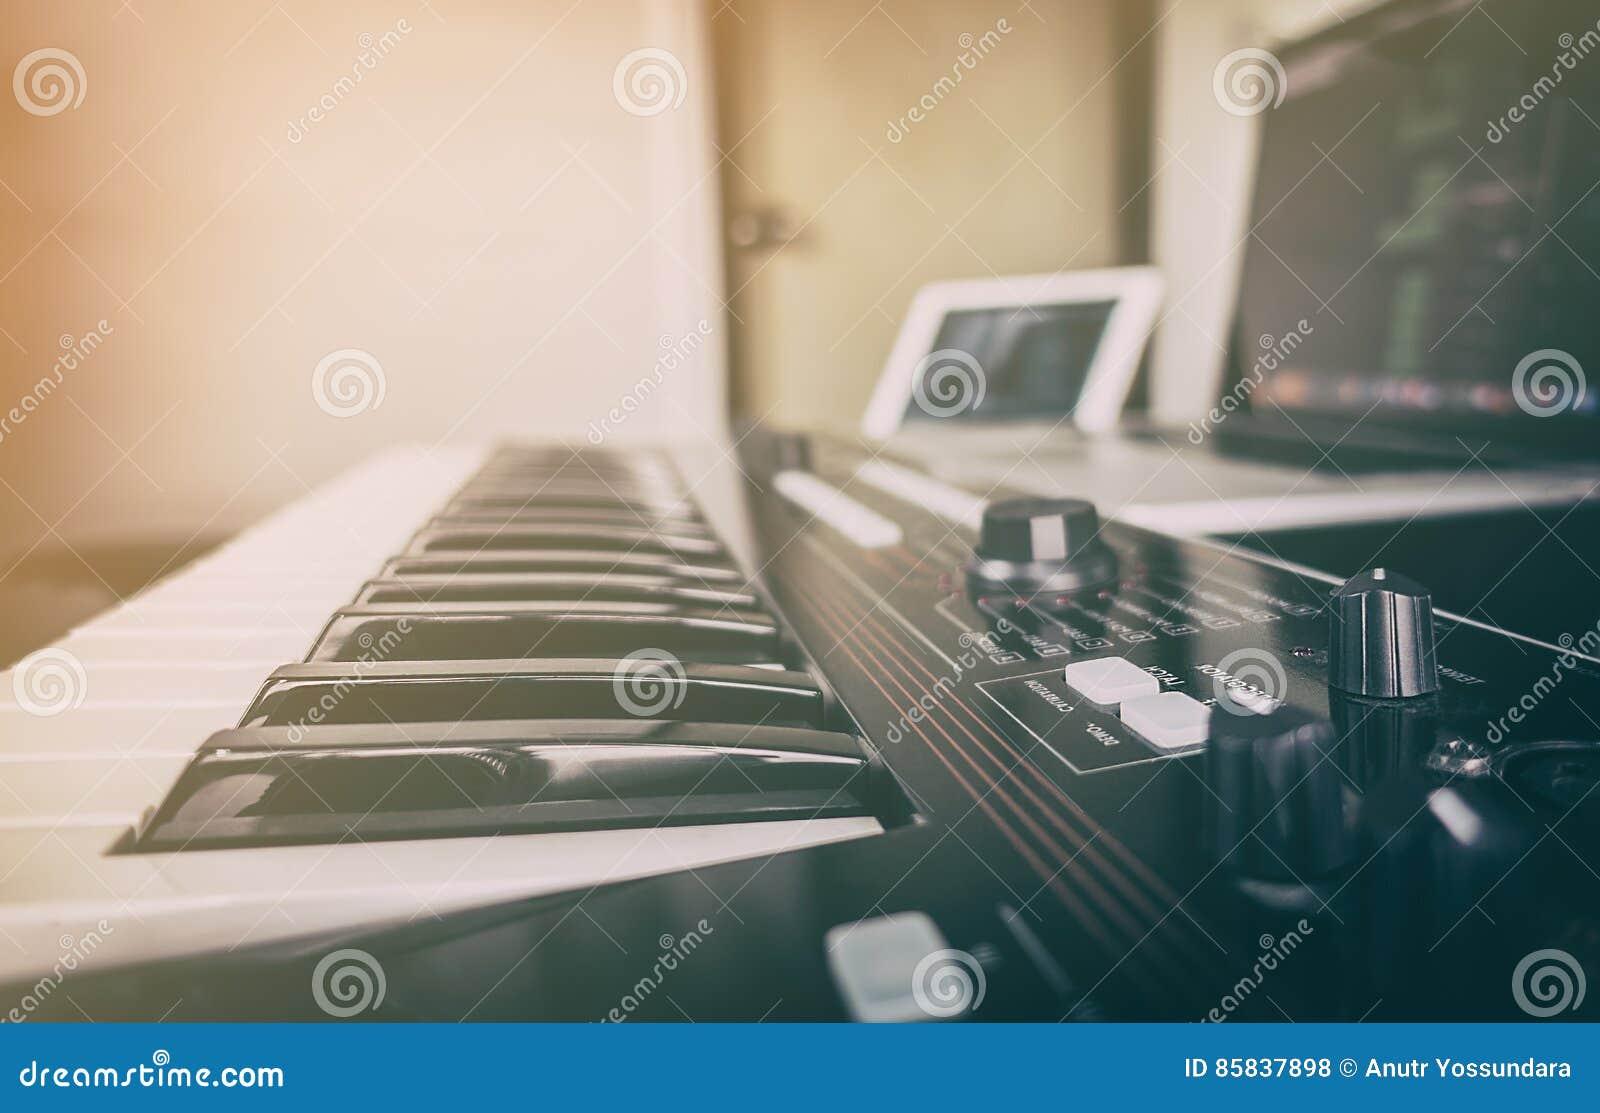 Synthesizertoetsenbord voor muziekproductie